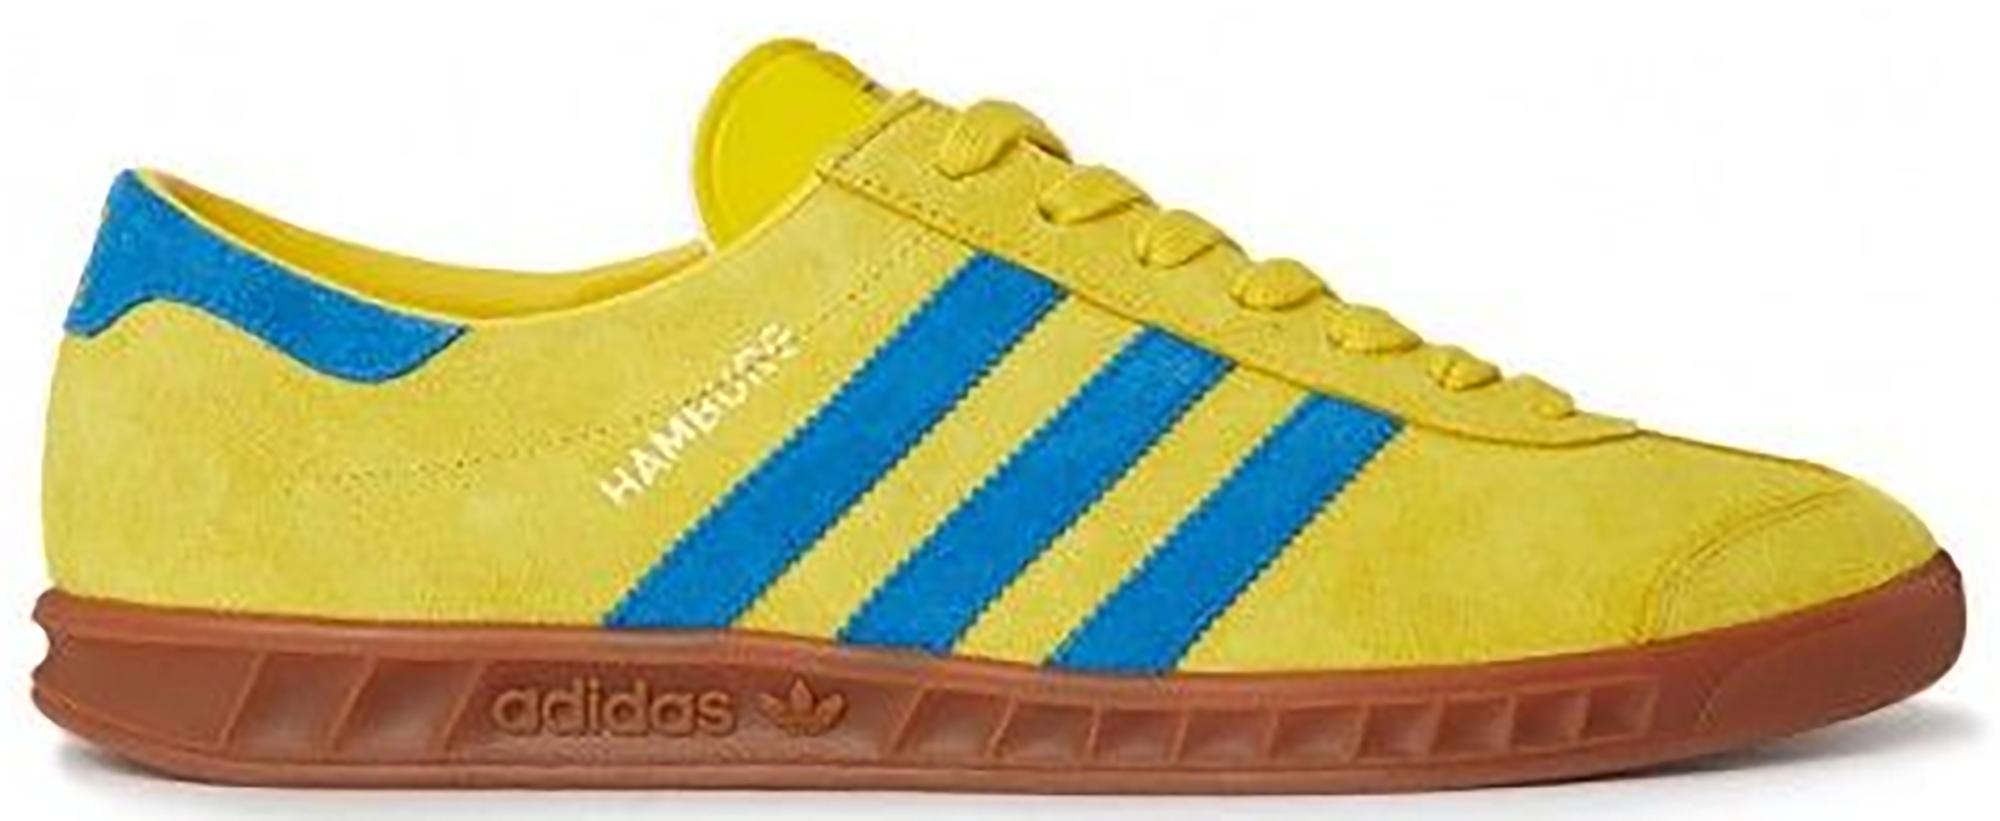 adidas hamburg green and yellow cheap online